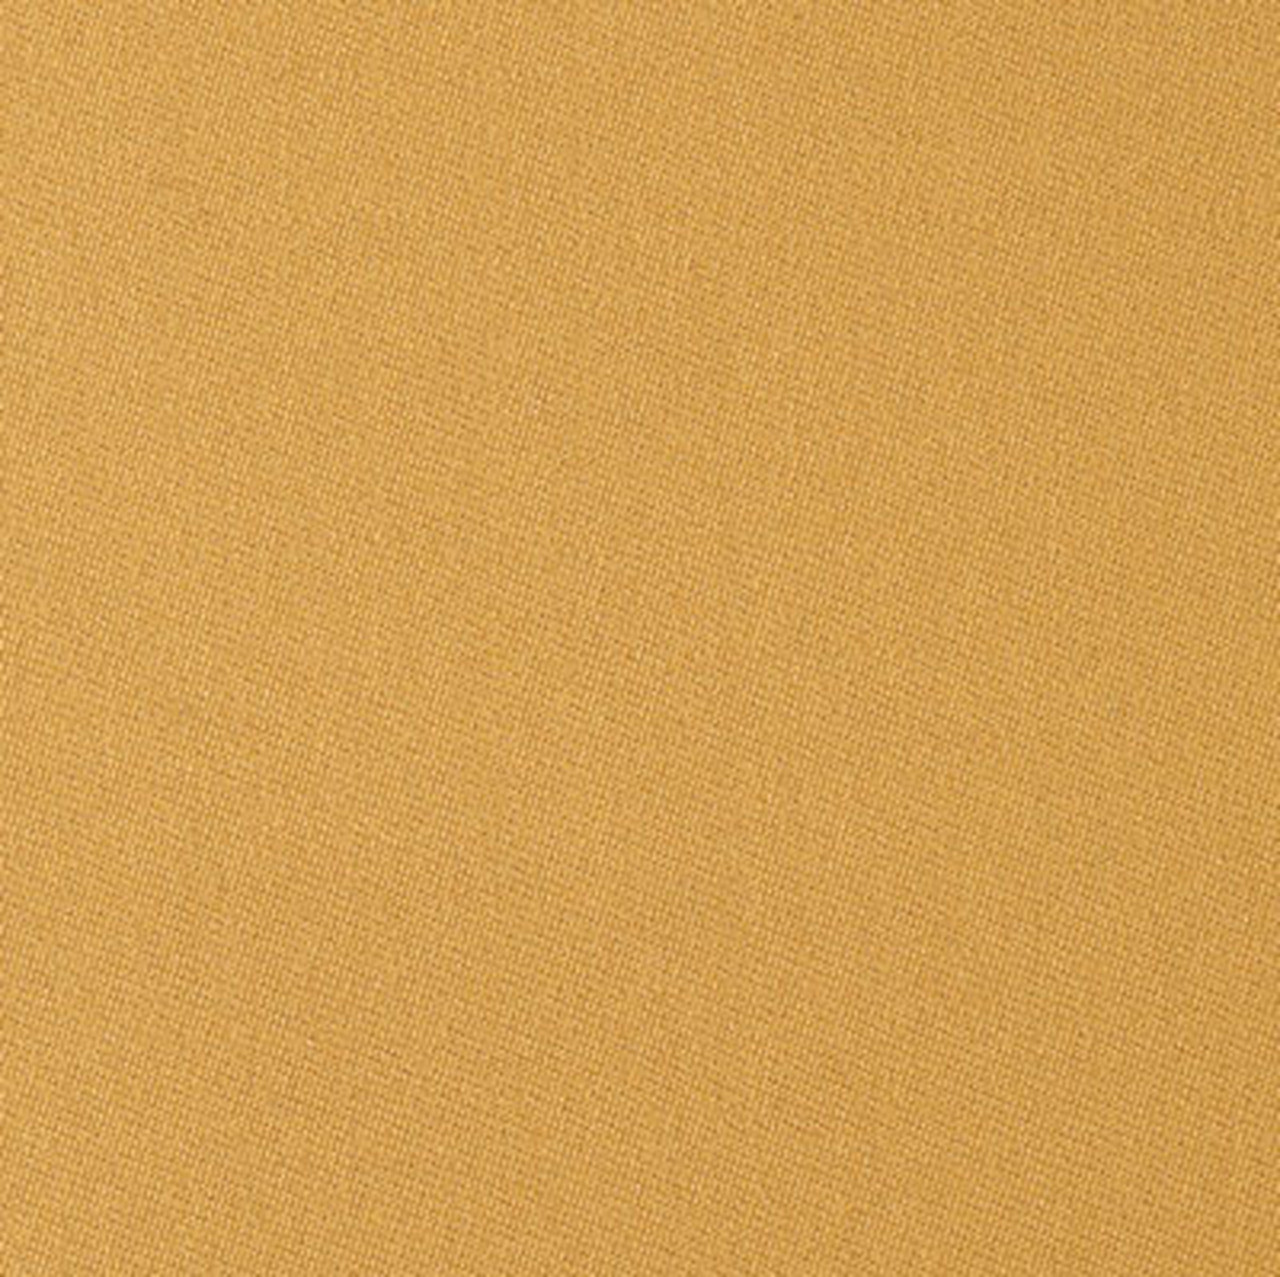 Simonis 860 Gold Pool Table Felt - 7ft